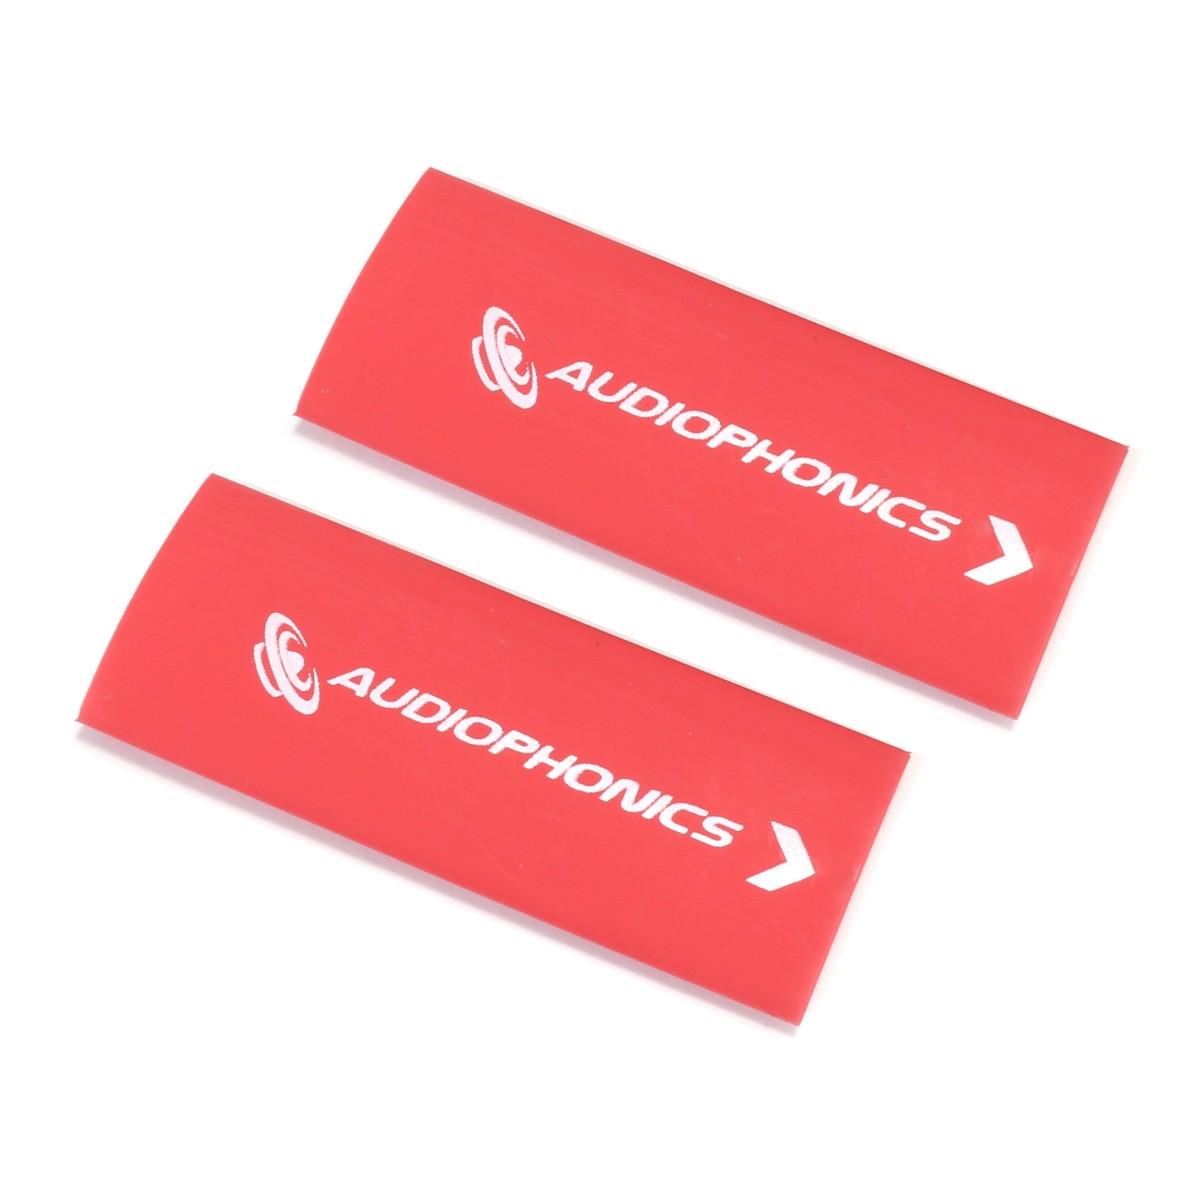 AUDIOPHONICS Heat-shrink tubing 3:1 Ø12mm Red (2x50m)